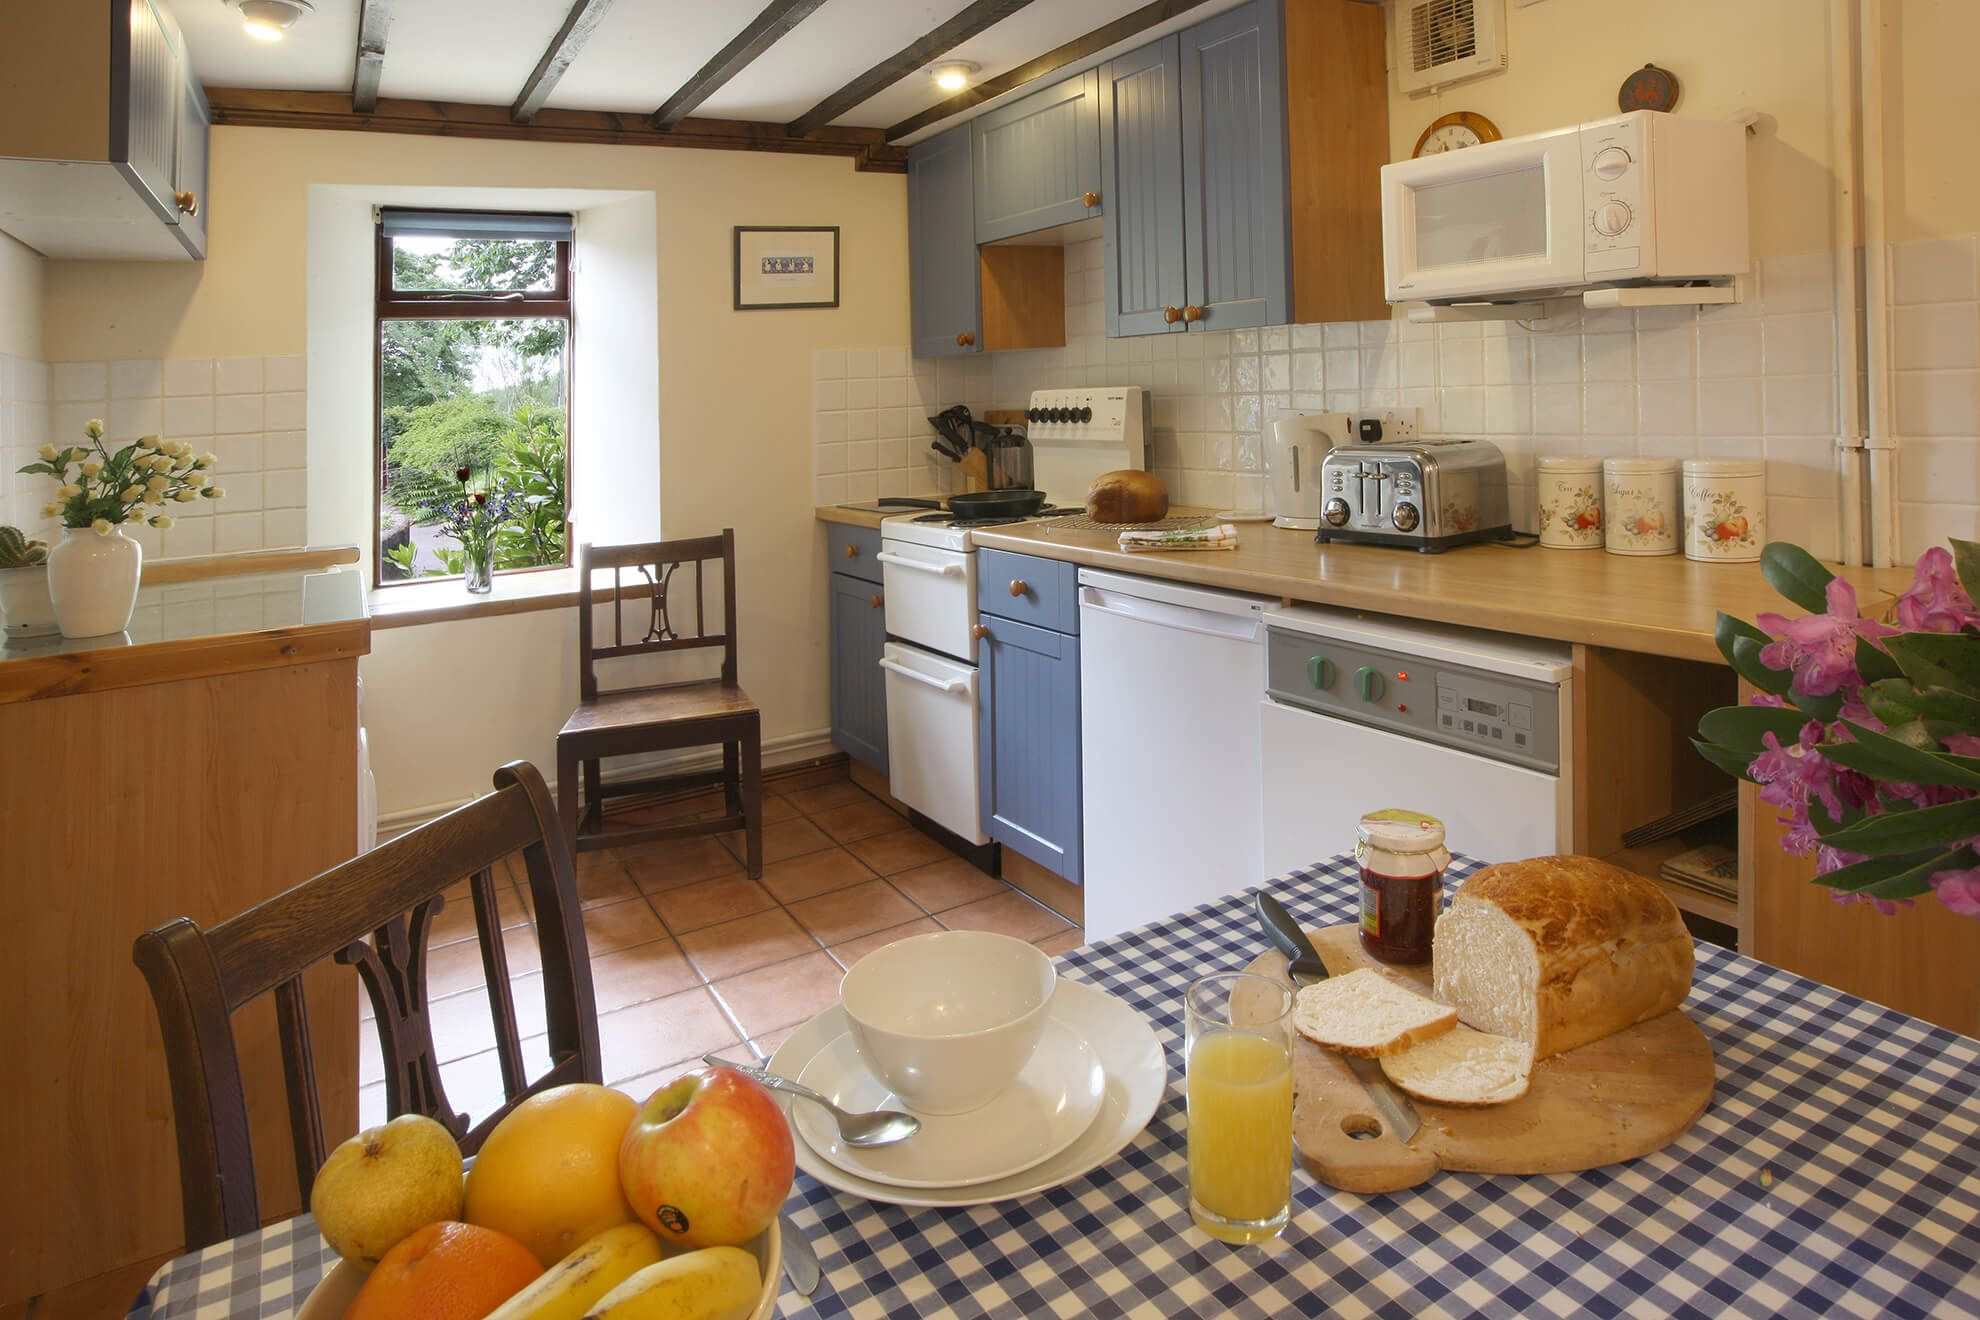 Ground floor: Farmhouse kitchen with dining area